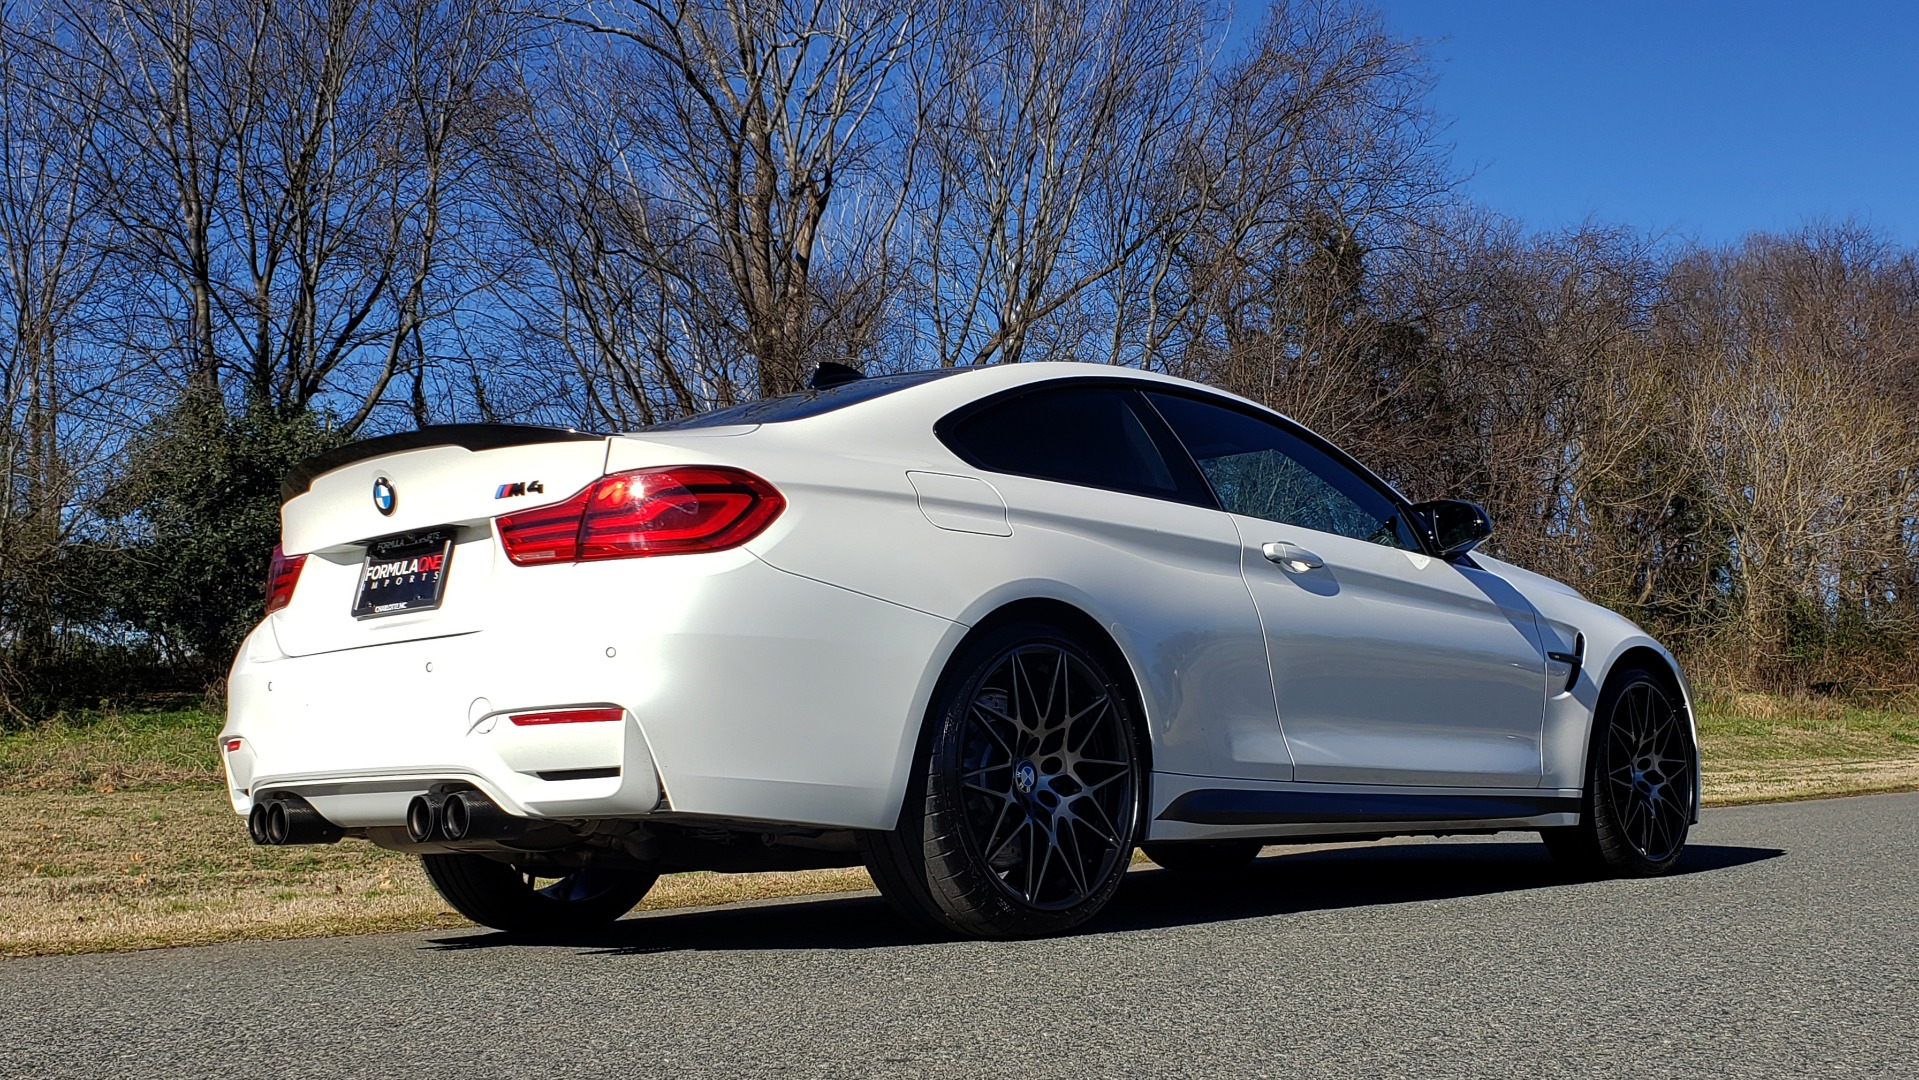 Used 2018 BMW M4 COMP PKG / EXEC / M-DRIVER / PARK CNTRL / ACTIVE BLIND SPOT for sale Sold at Formula Imports in Charlotte NC 28227 8